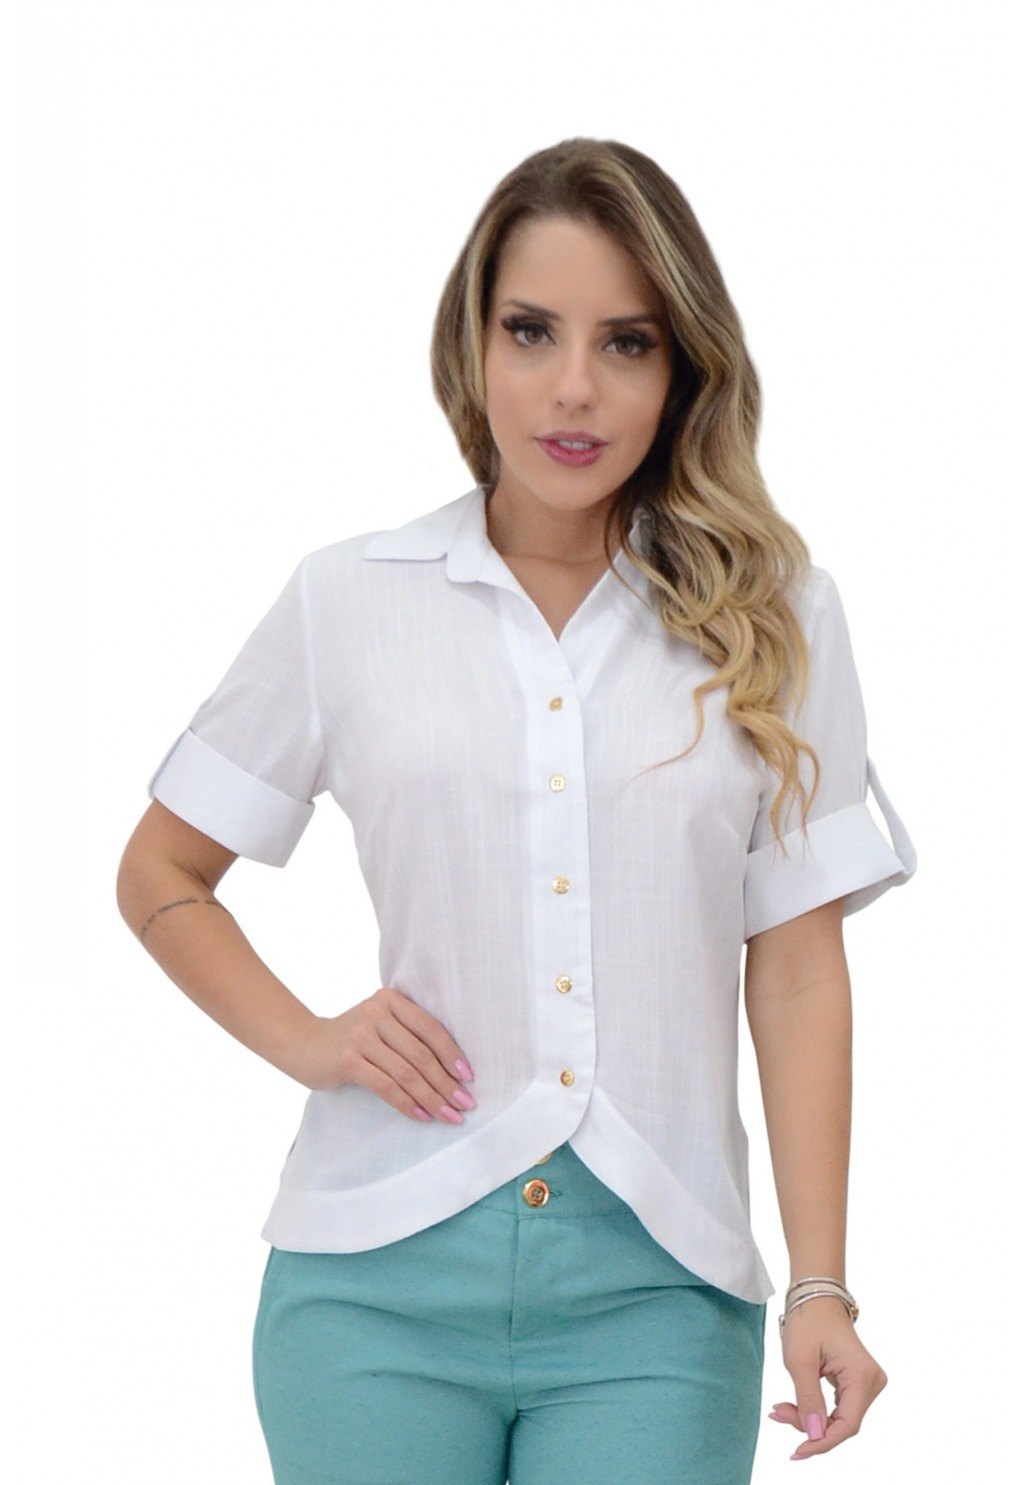 Blusa Mamorena camisa frente arredondada